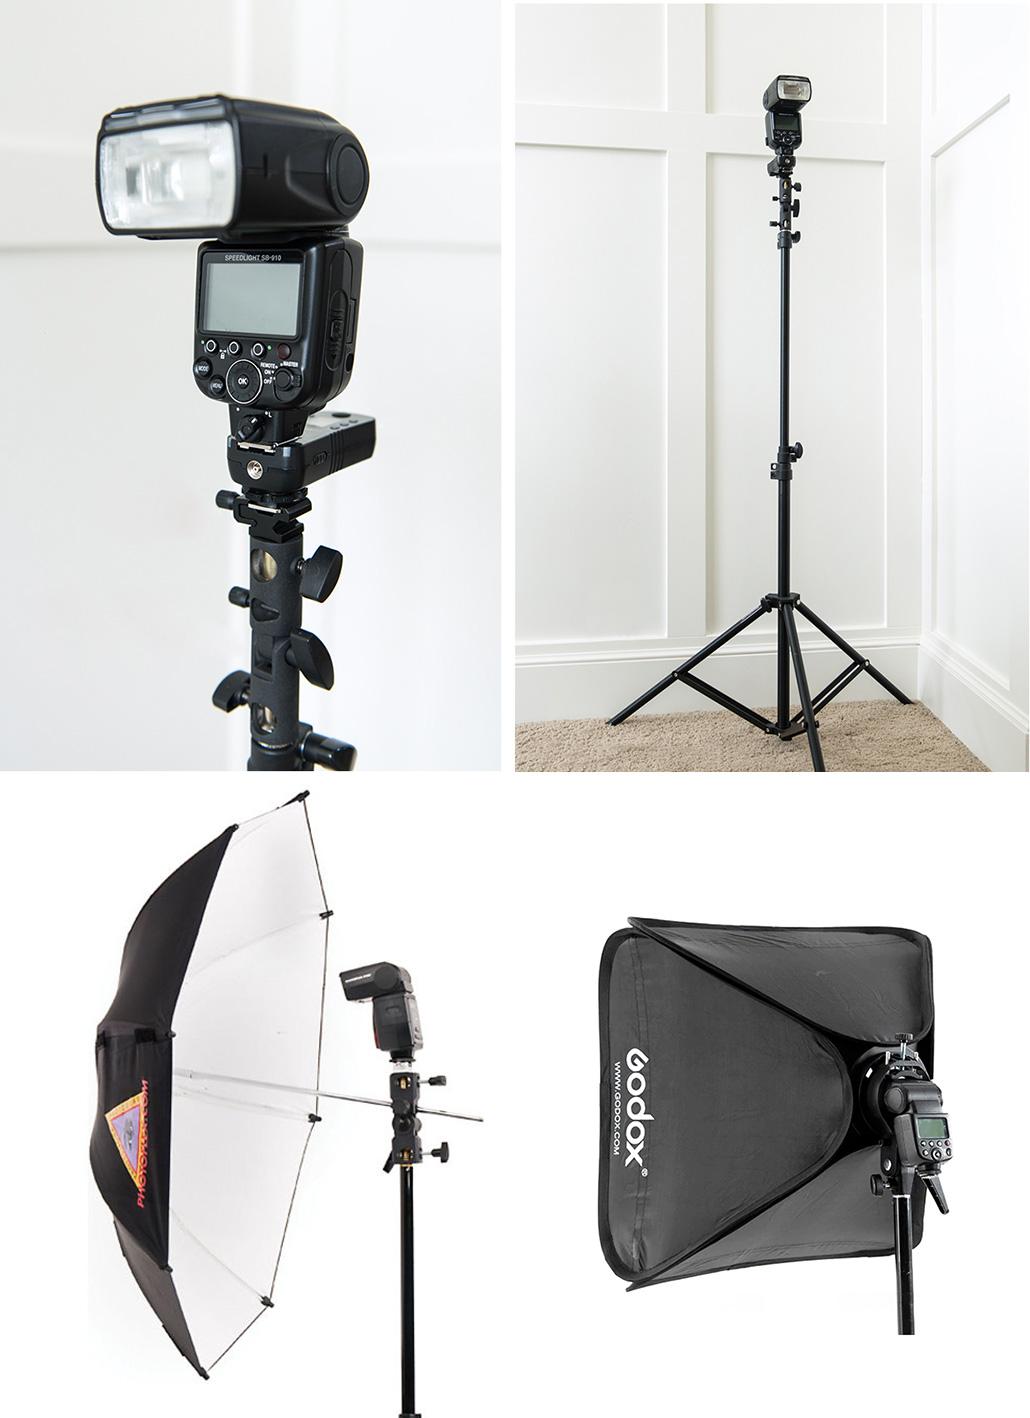 speedlight flash or off camera setup for newborn photography